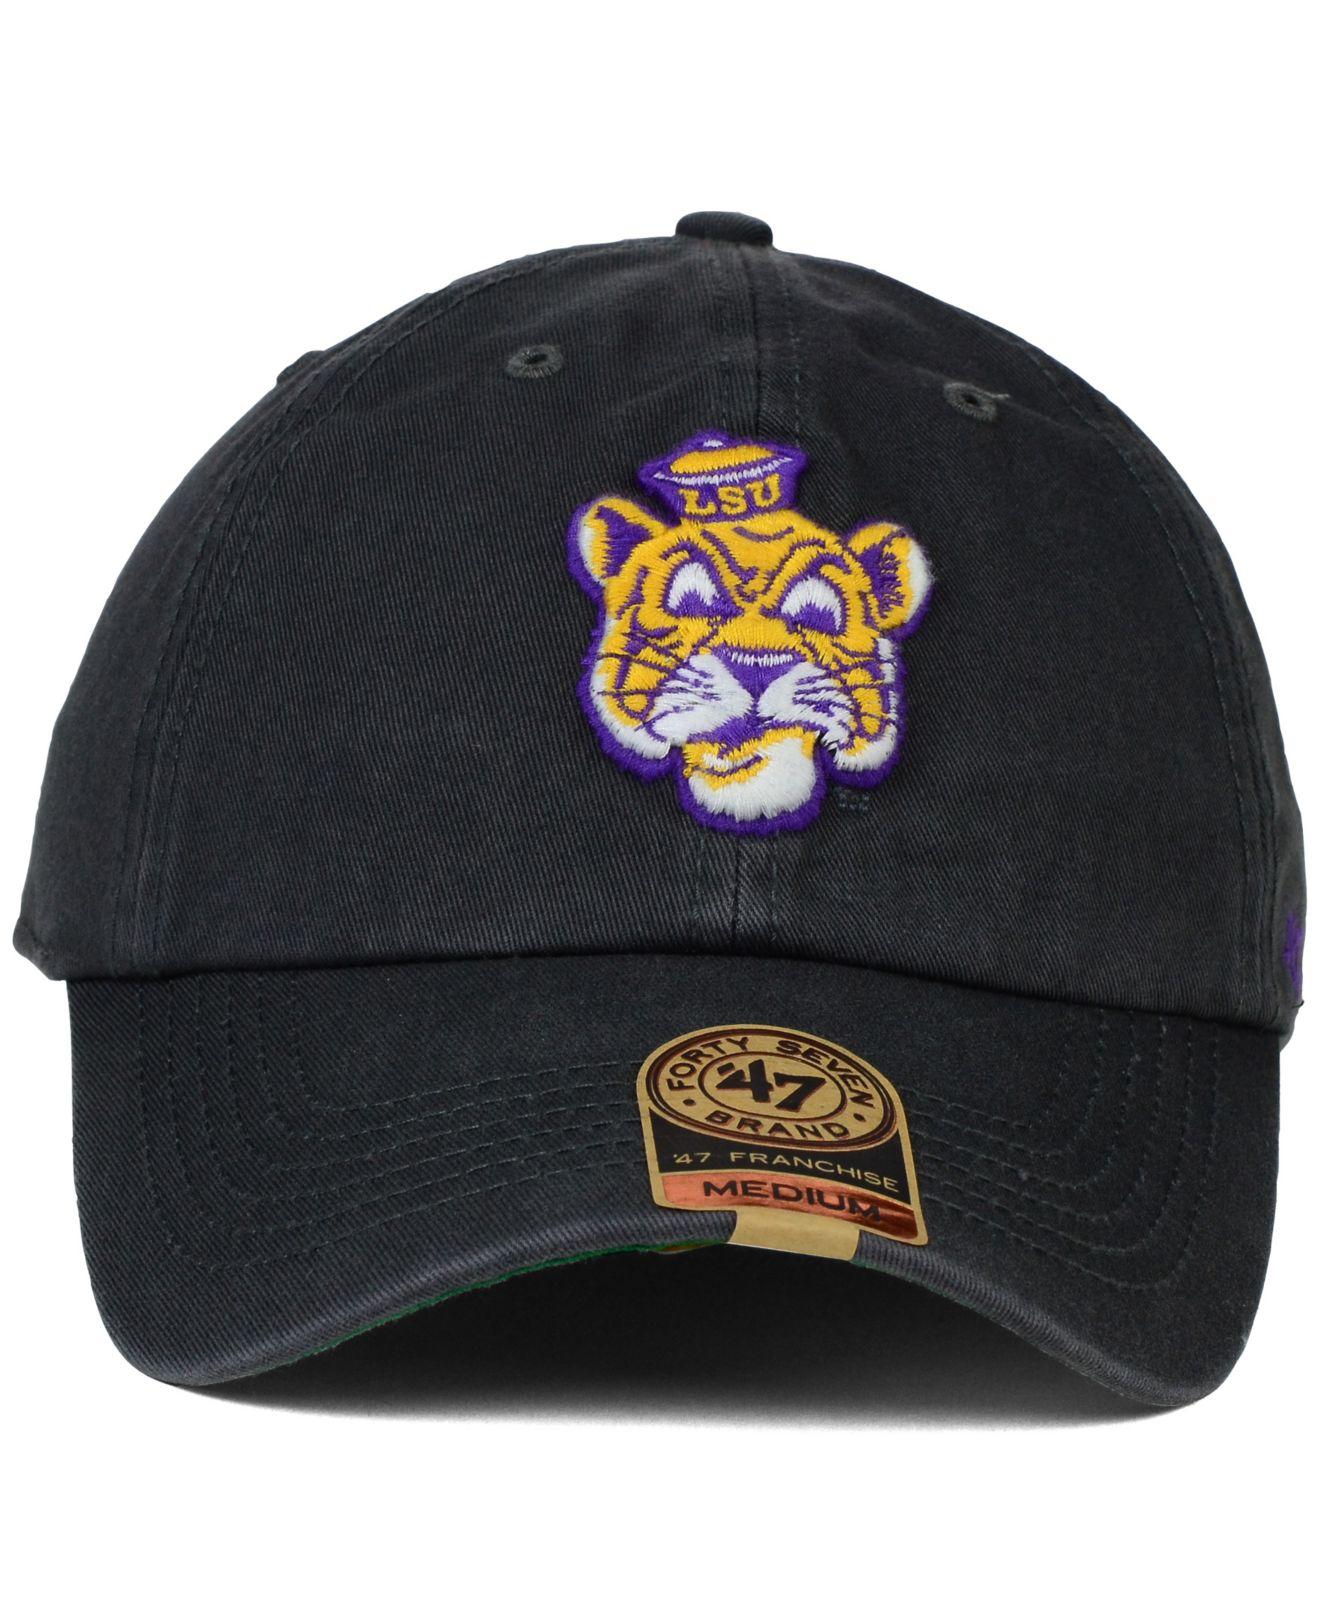 de54322f2d9a2 ... hat purple 328b6 f9812  sale lyst 47 brand lsu tigers vault franchise  cap in gray for men 9f83d 73df7